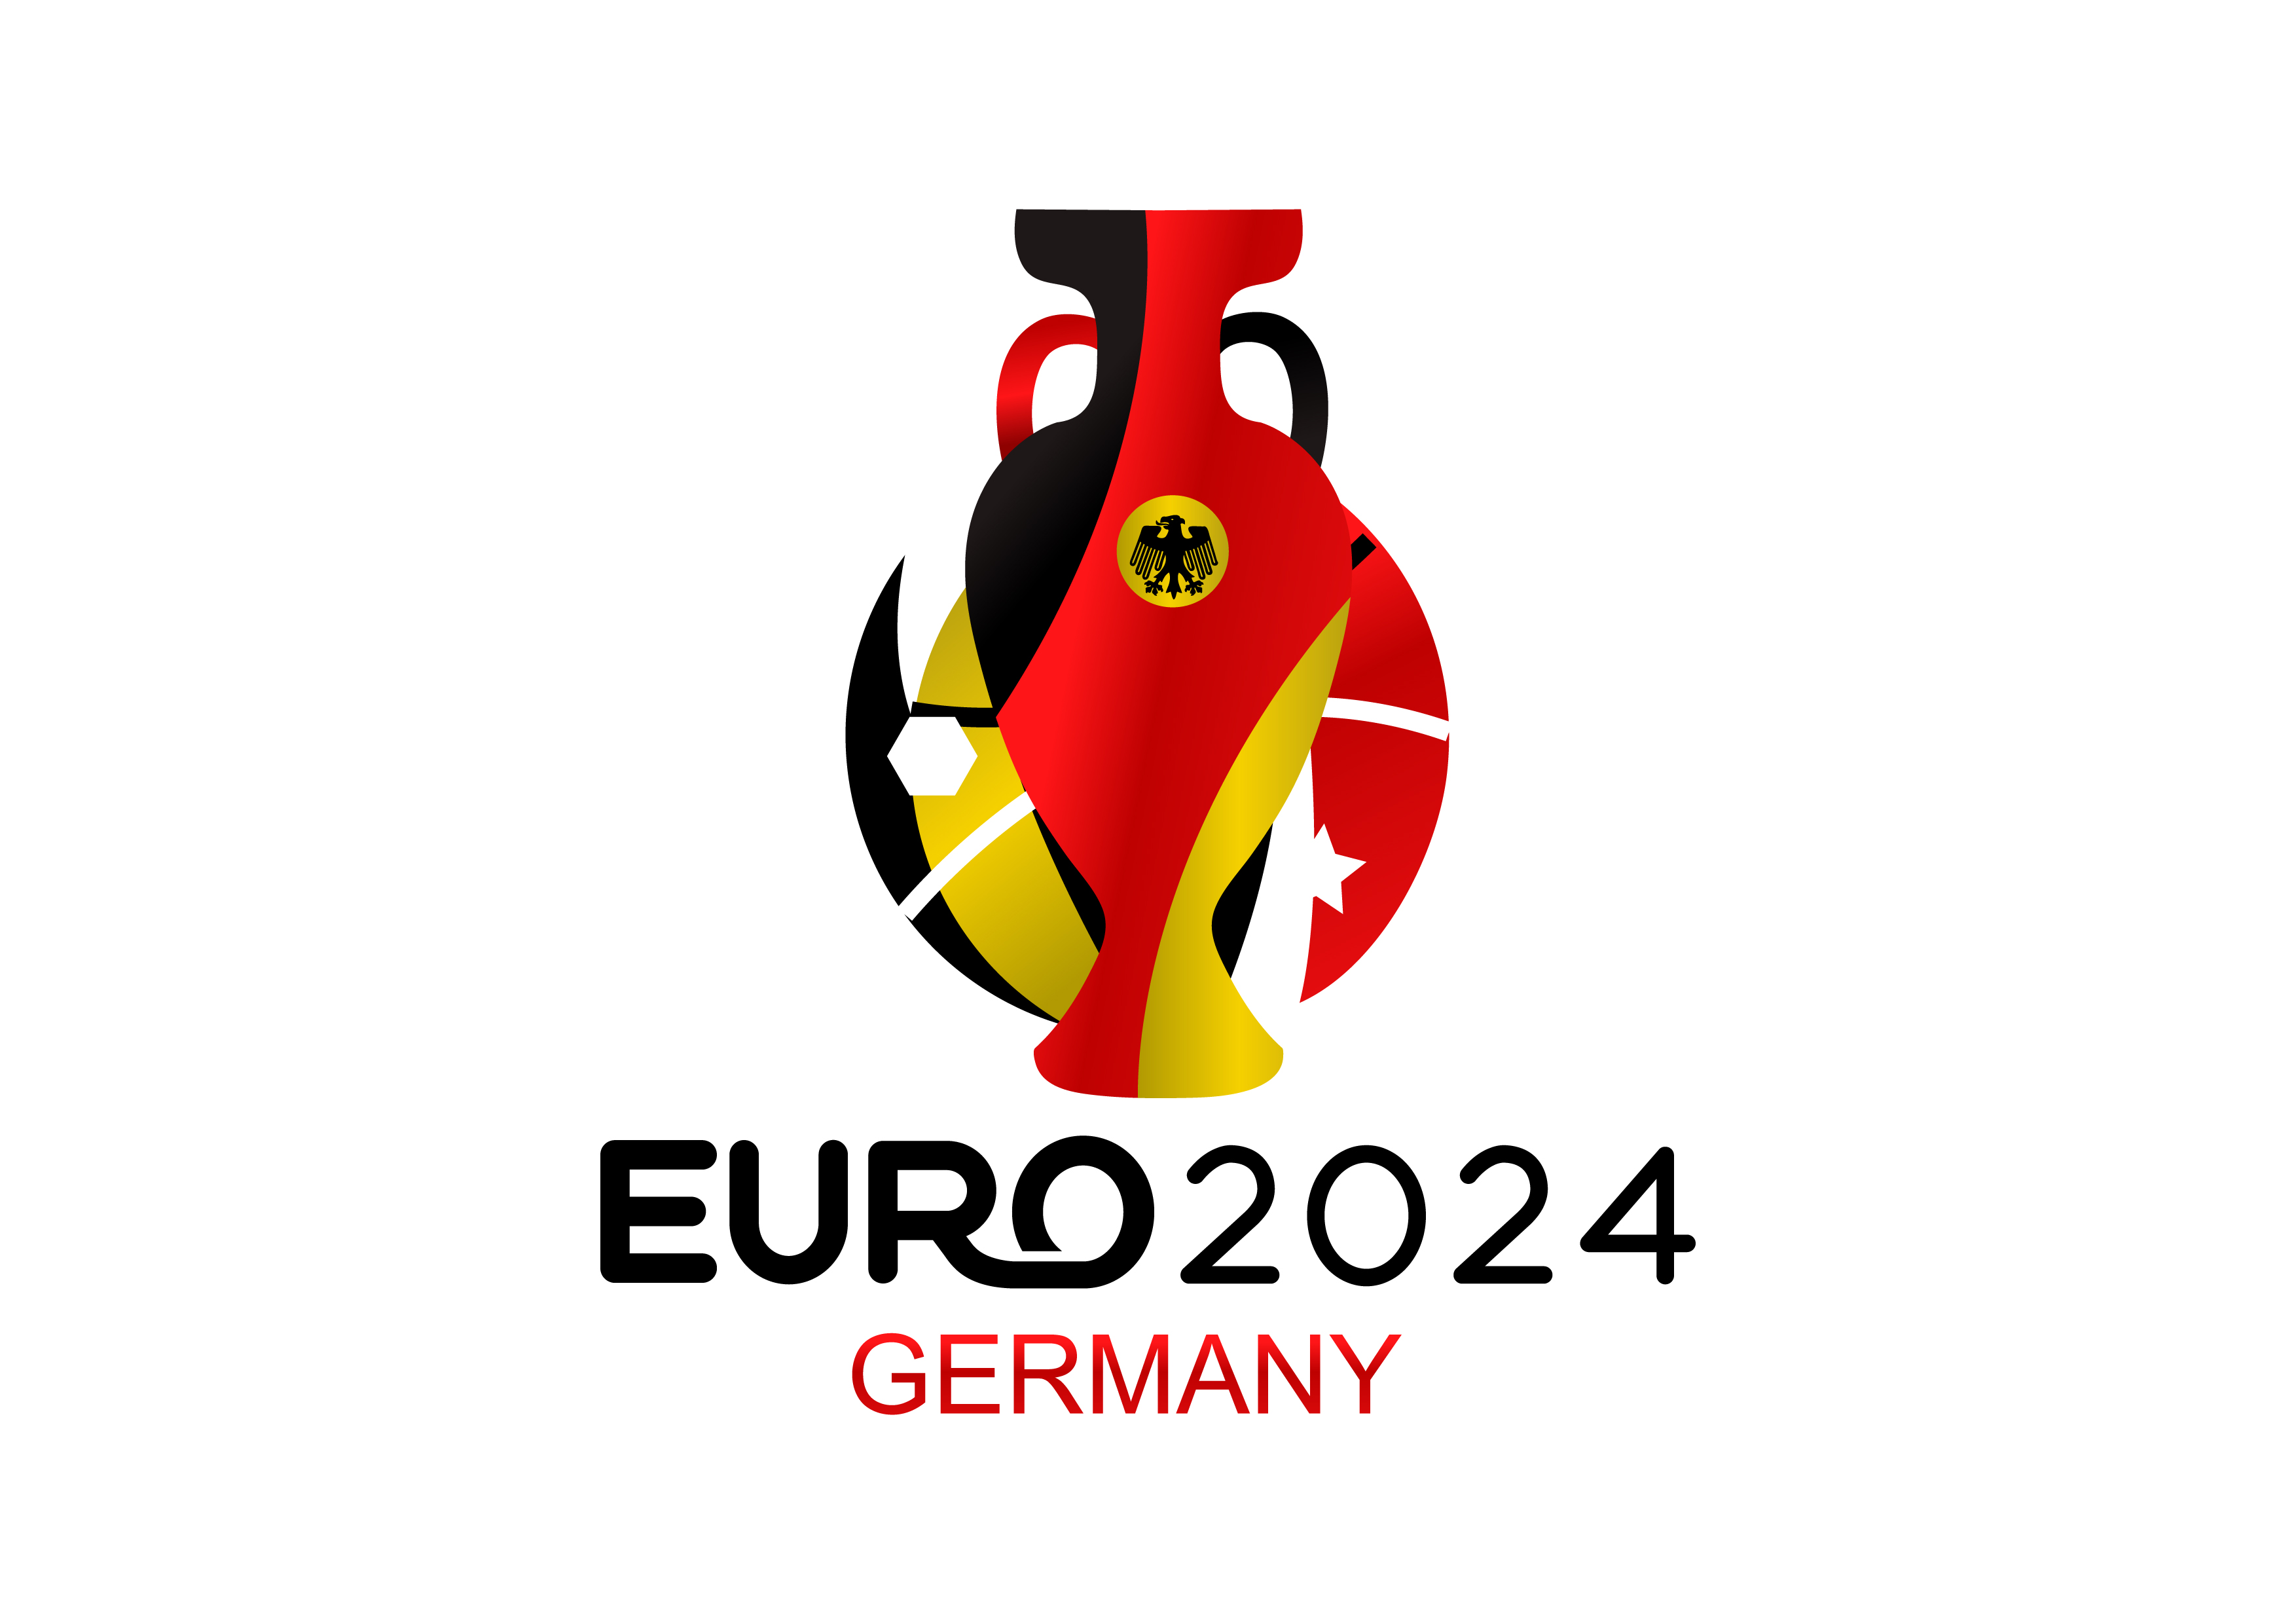 jovoto euro 2024 germany aim shoot score your 2024 bid logo deutscher fussball bund jovoto euro 2024 germany aim shoot